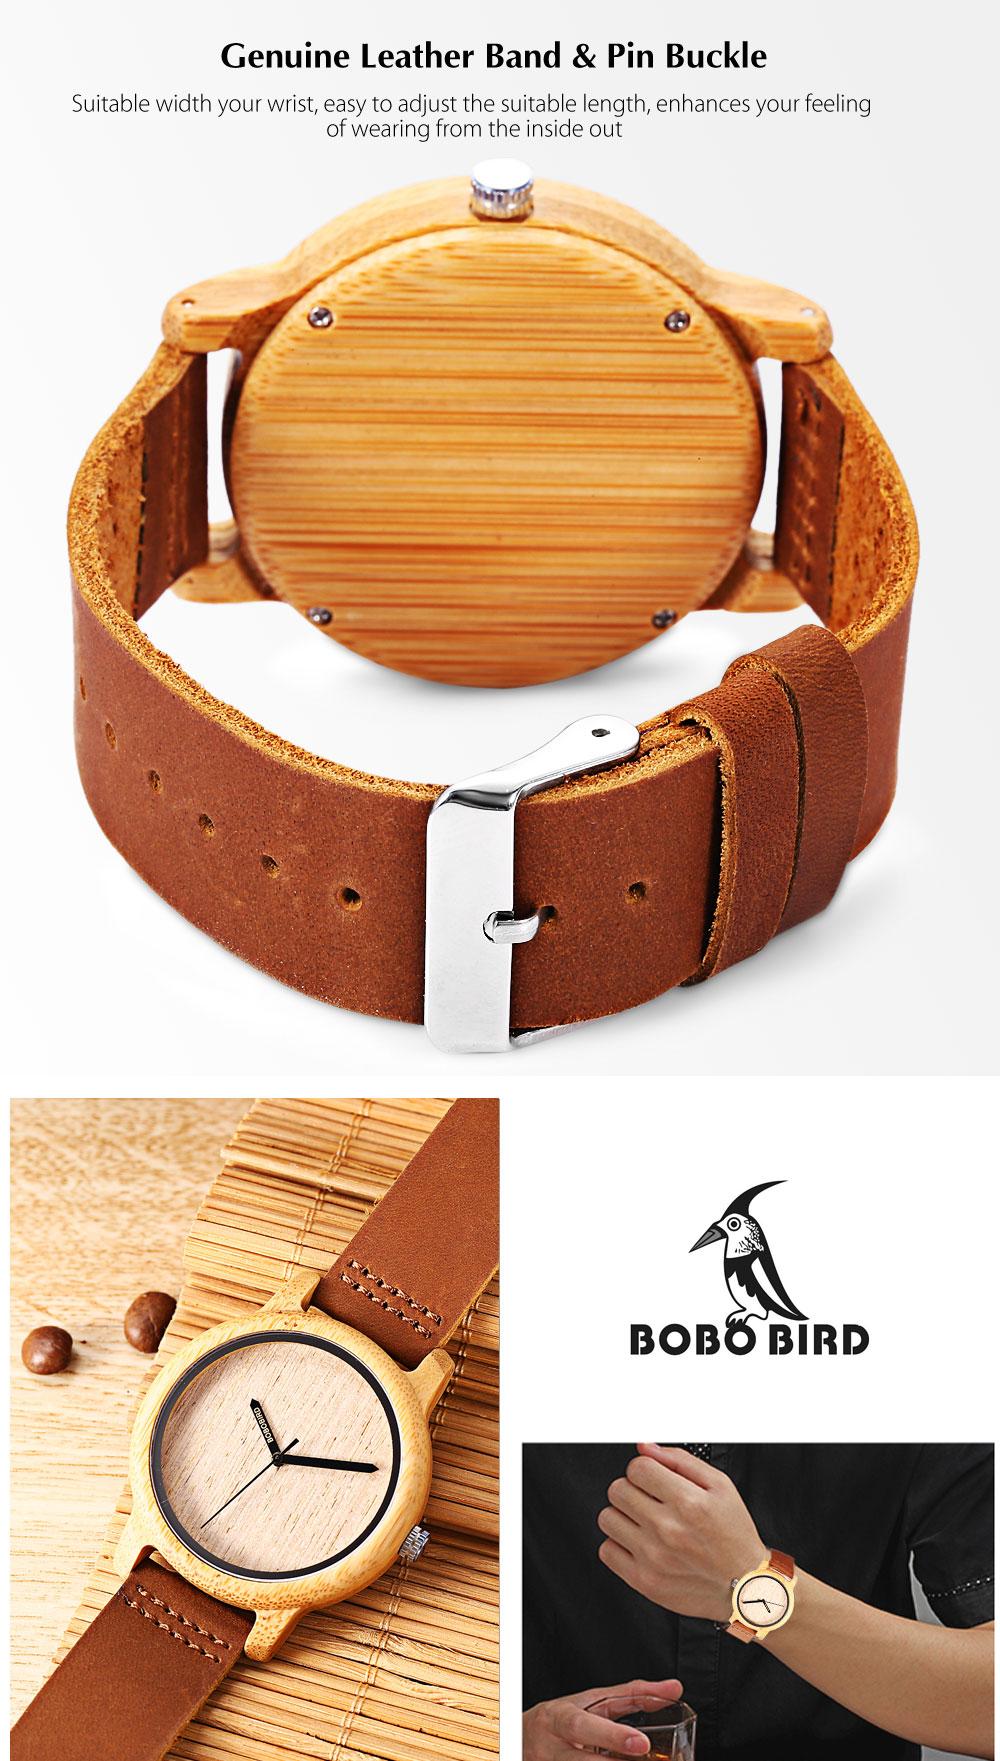 BOBO BIRD A22 unisex Quartz karóra - Barna - Férfi óra - A-Z ... c8e68129bf